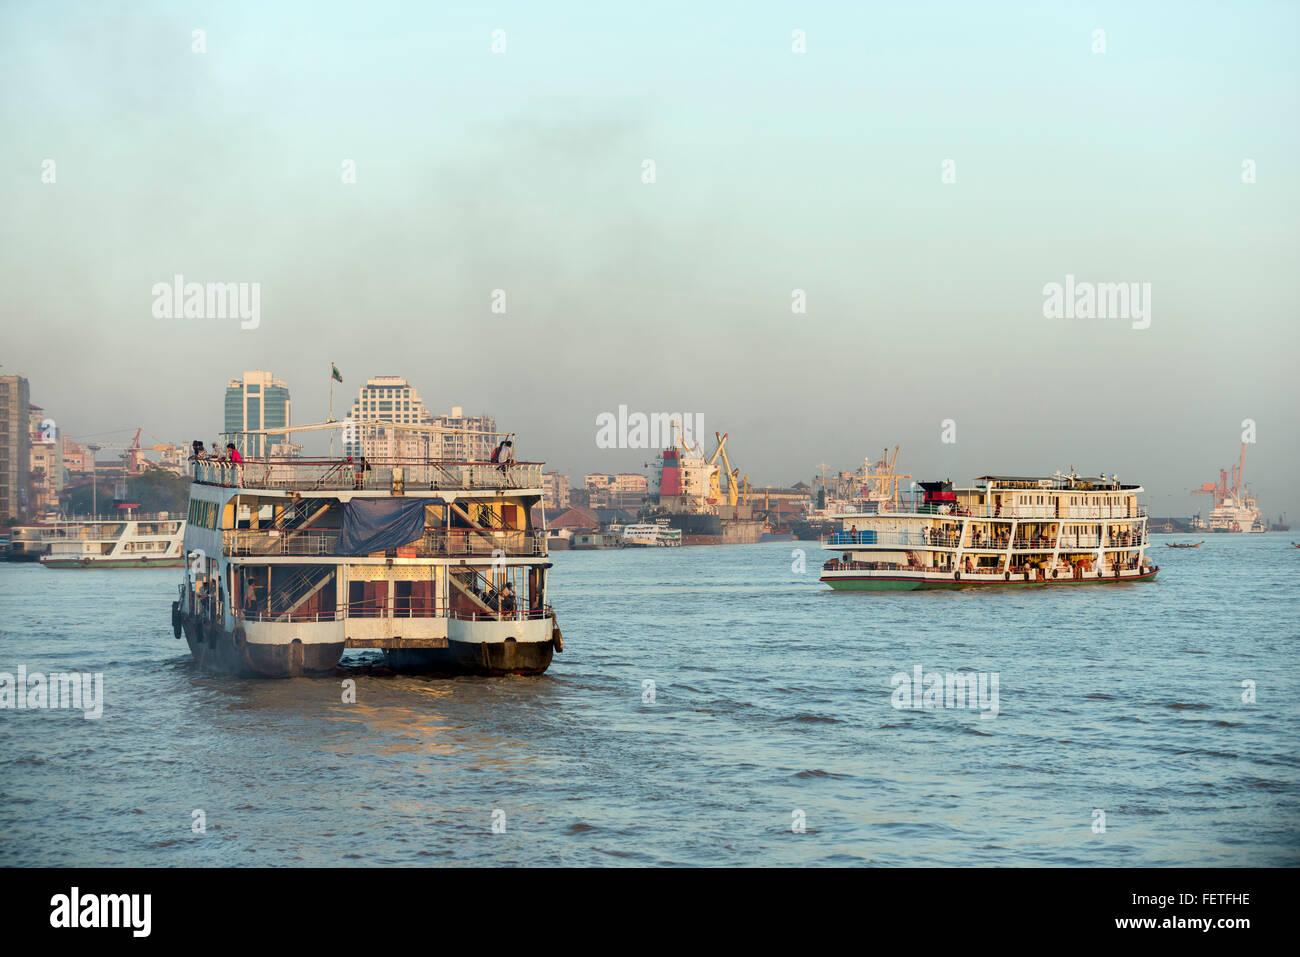 Passenger boats on the Irrawaddy river, Burma Stock Photo